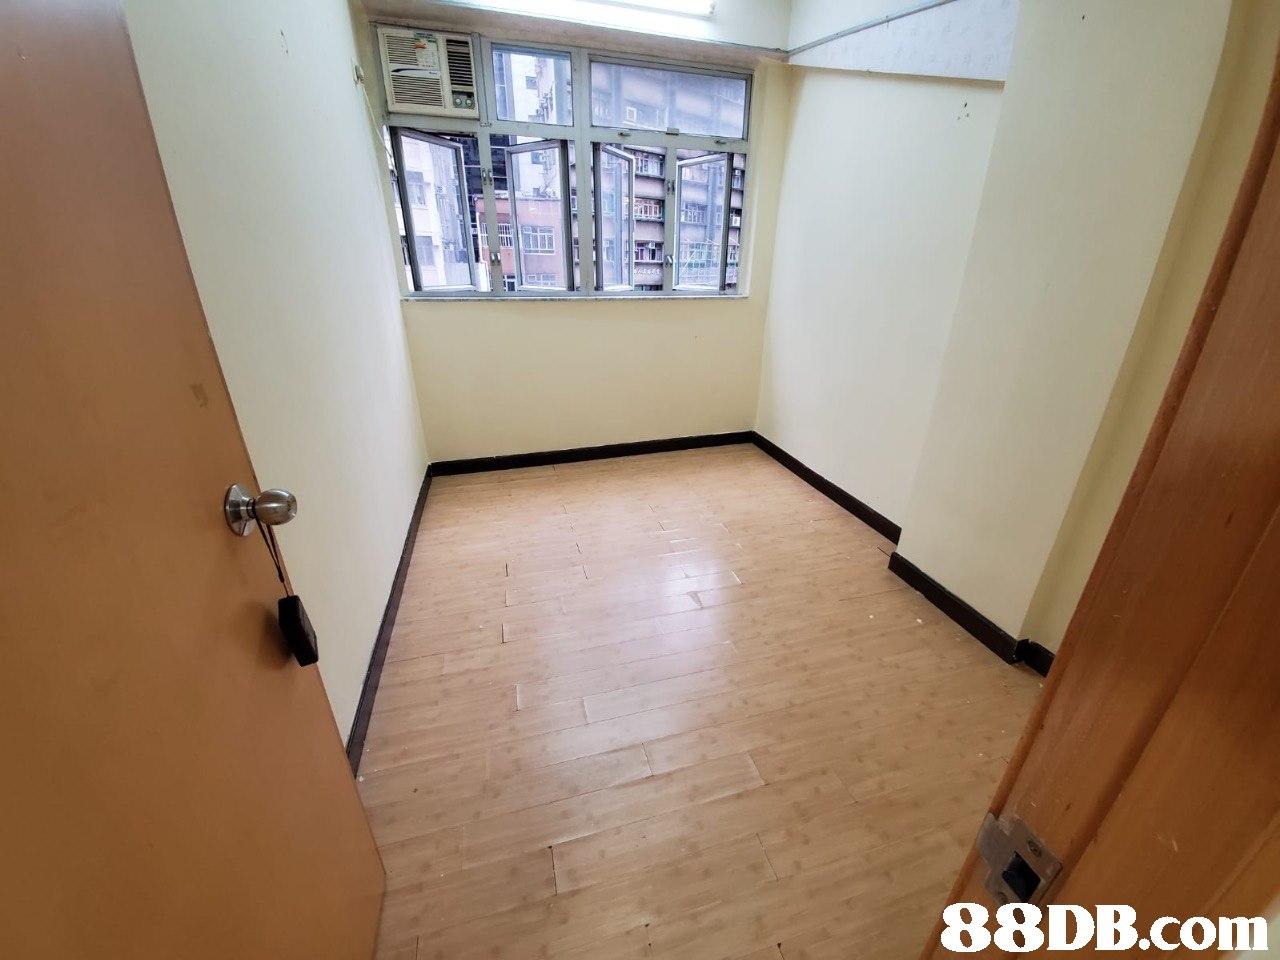 Floor,Property,Room,Flooring,Hardwood